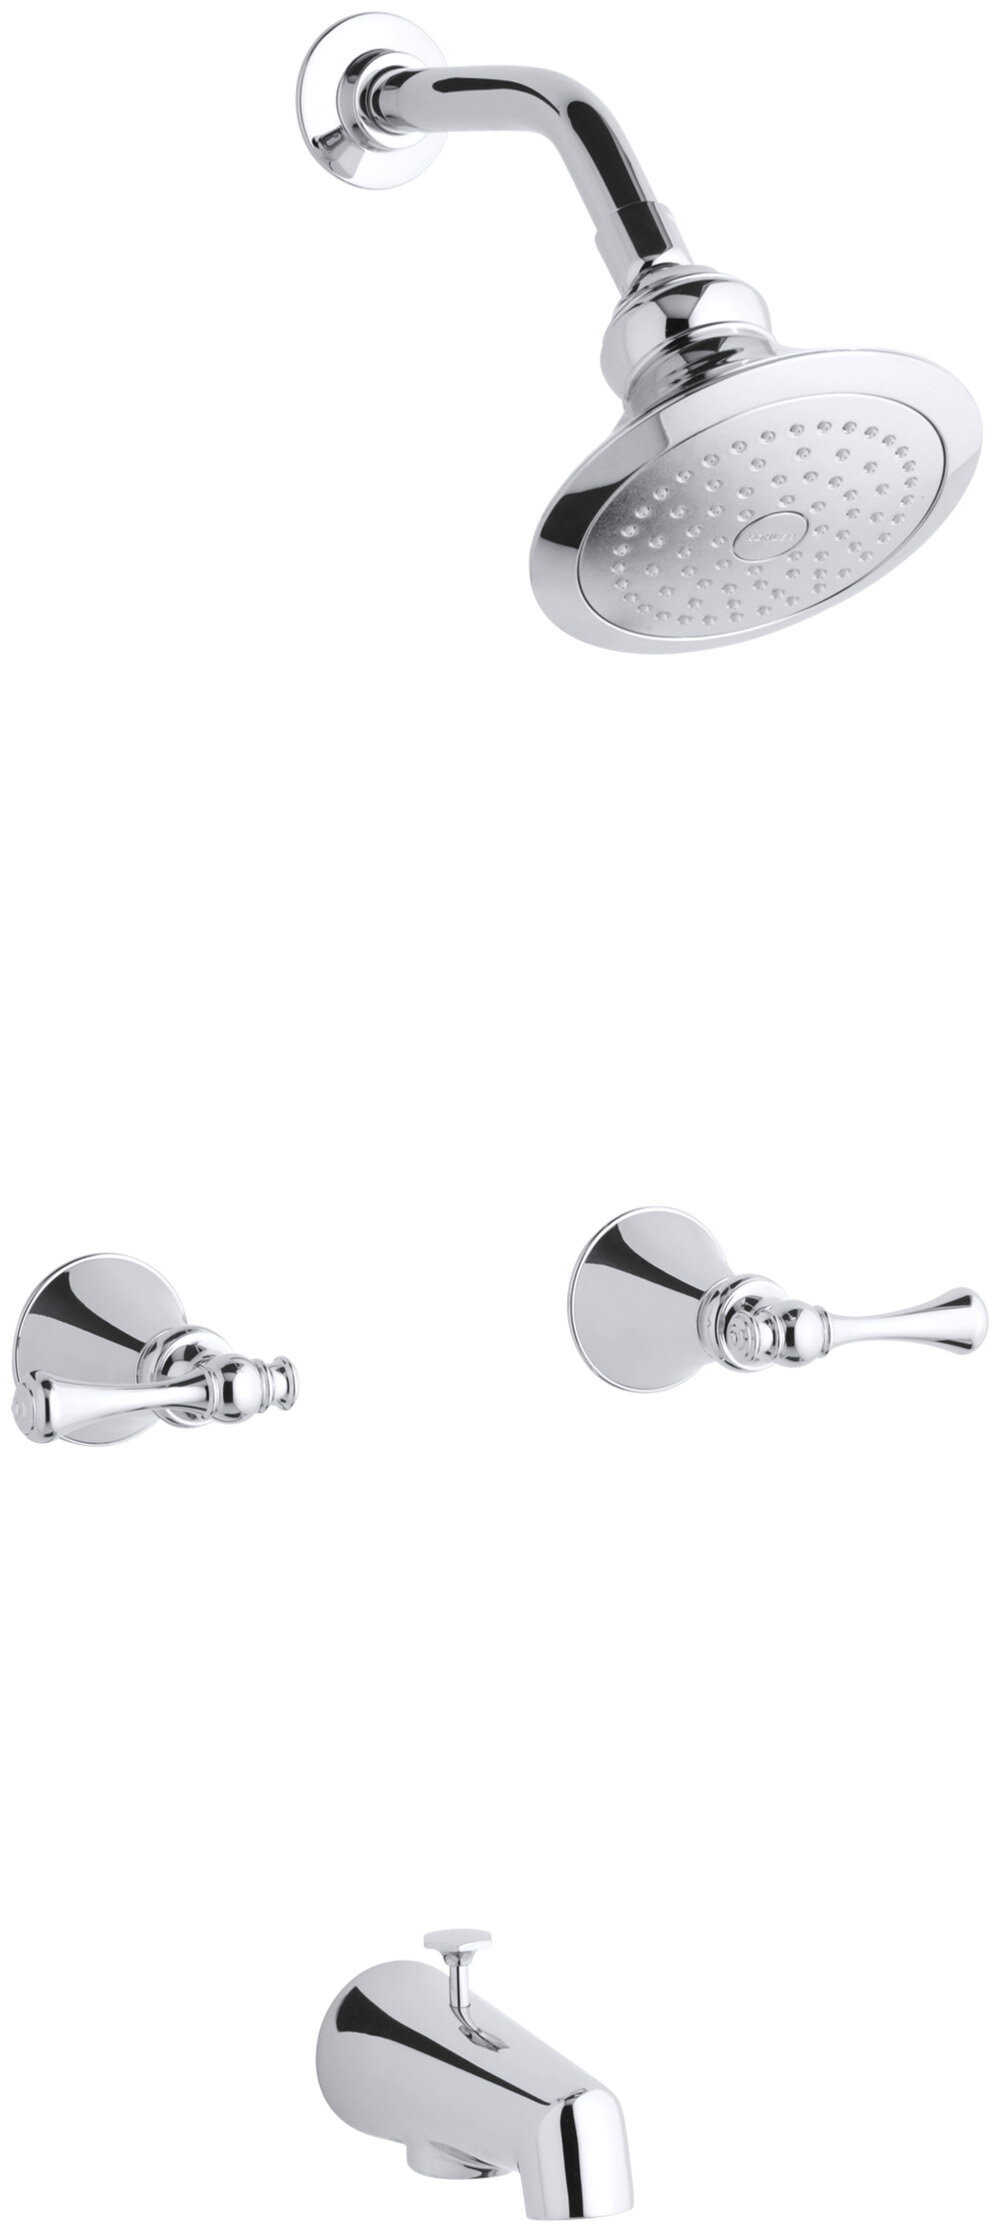 K-16213-4A-BN,BV,CP Kohler Revival Bath and Shower Faucet Set with ...